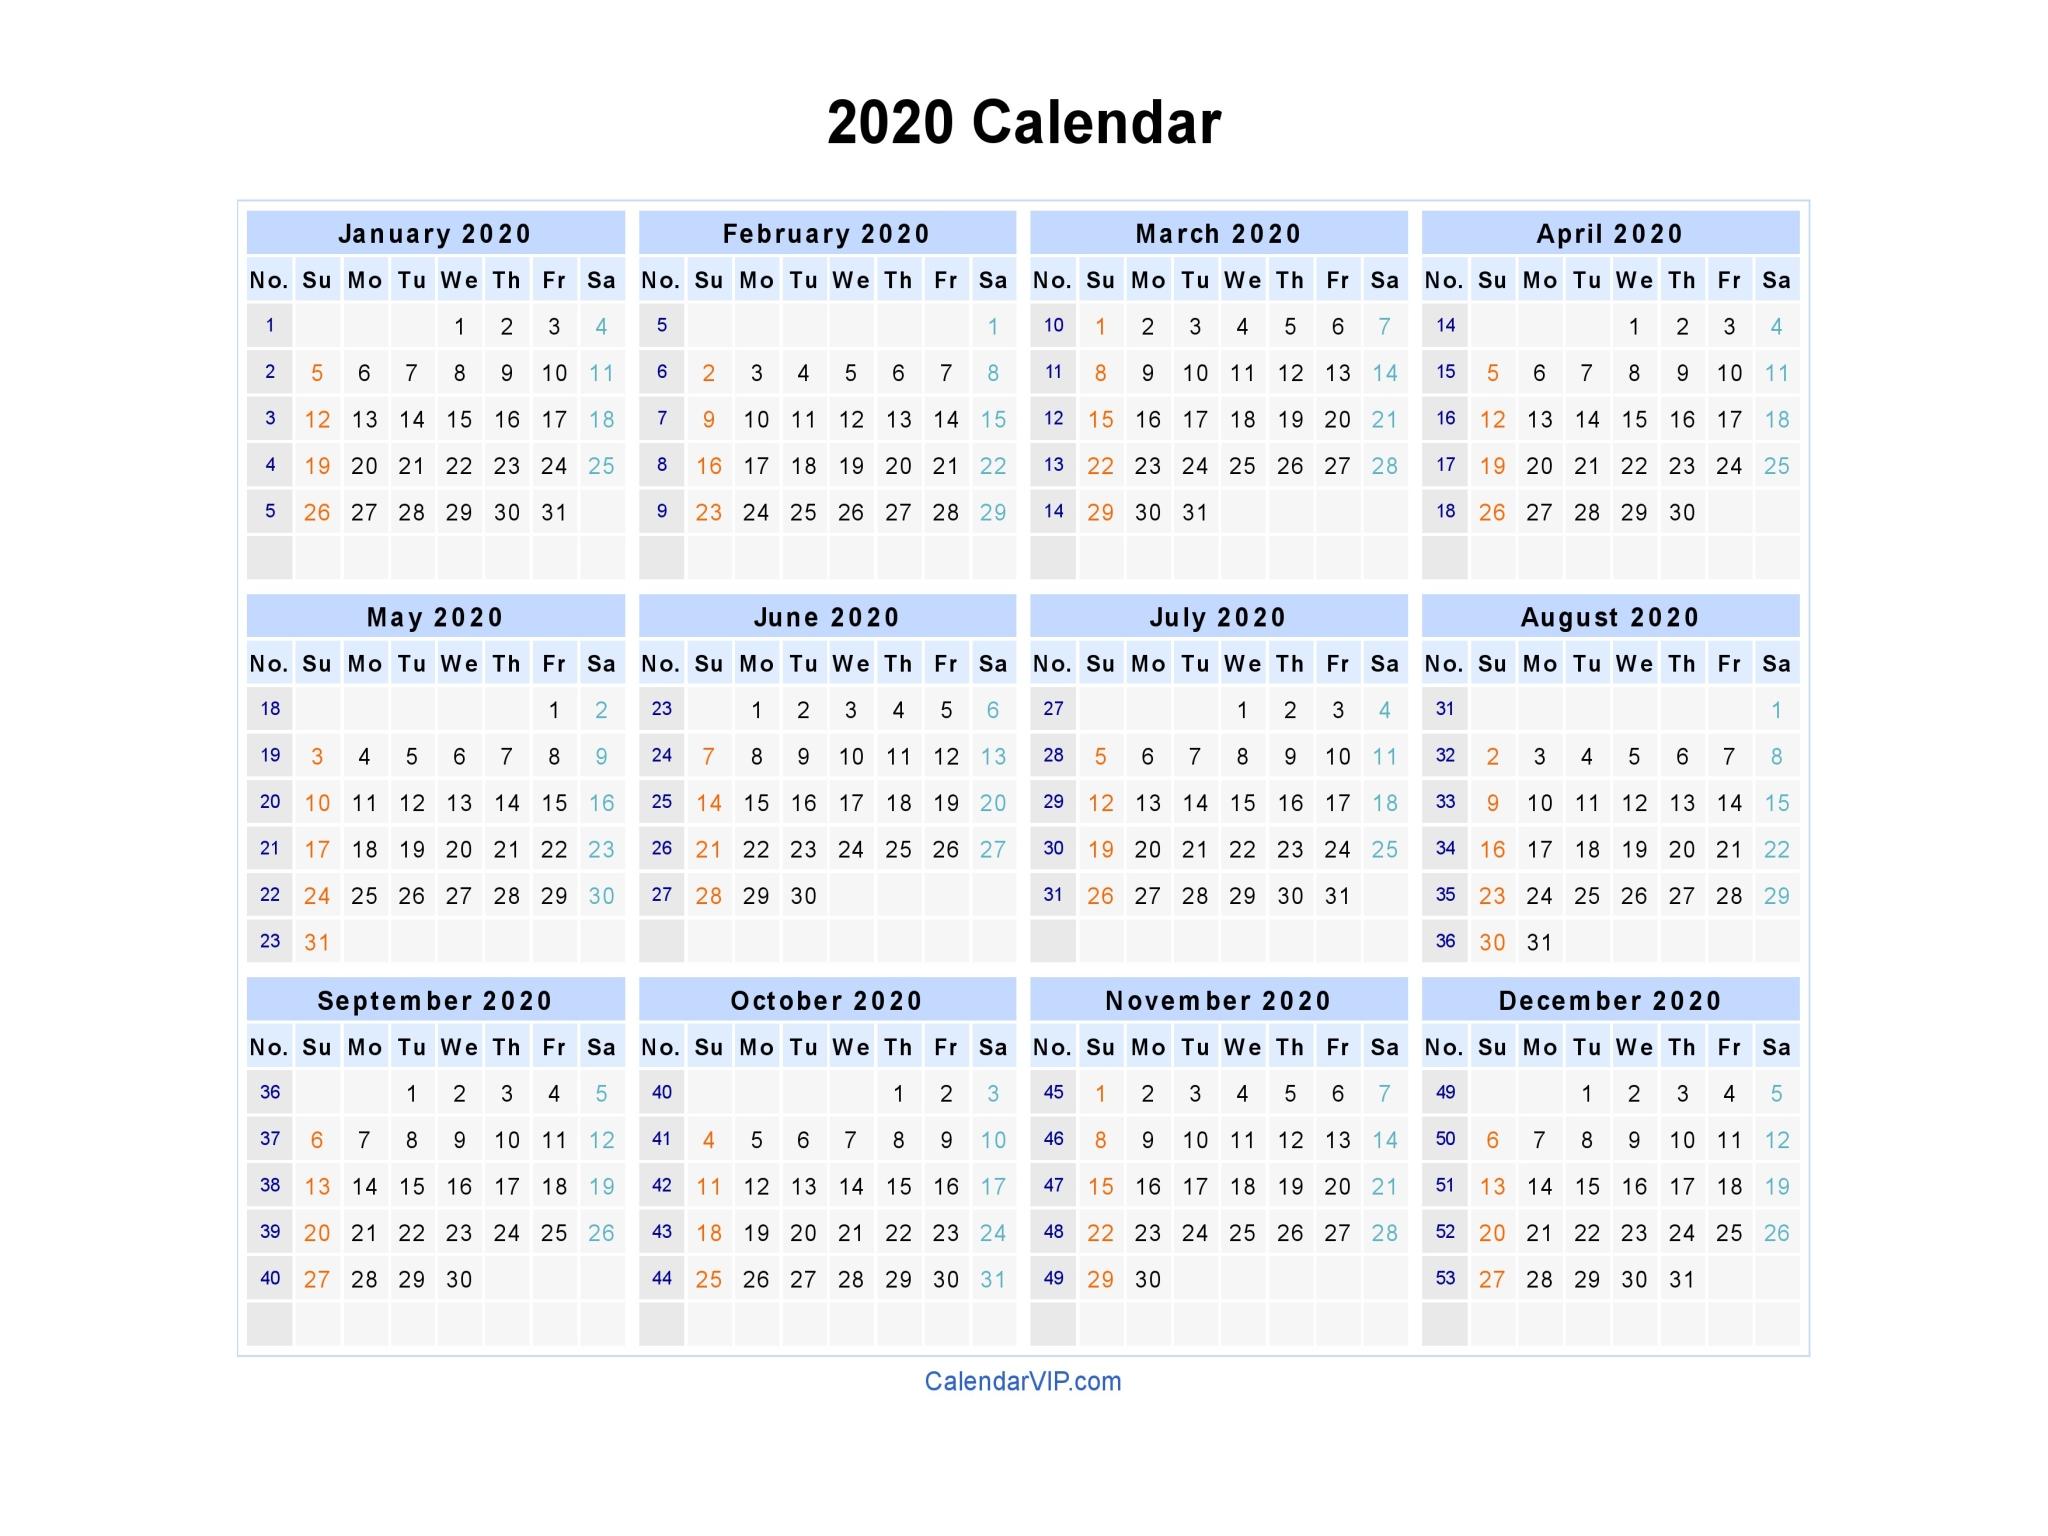 2020 Printable Calendar Word.2020 Calendar Blank Printable Calendar Template In Pdf Word Excel